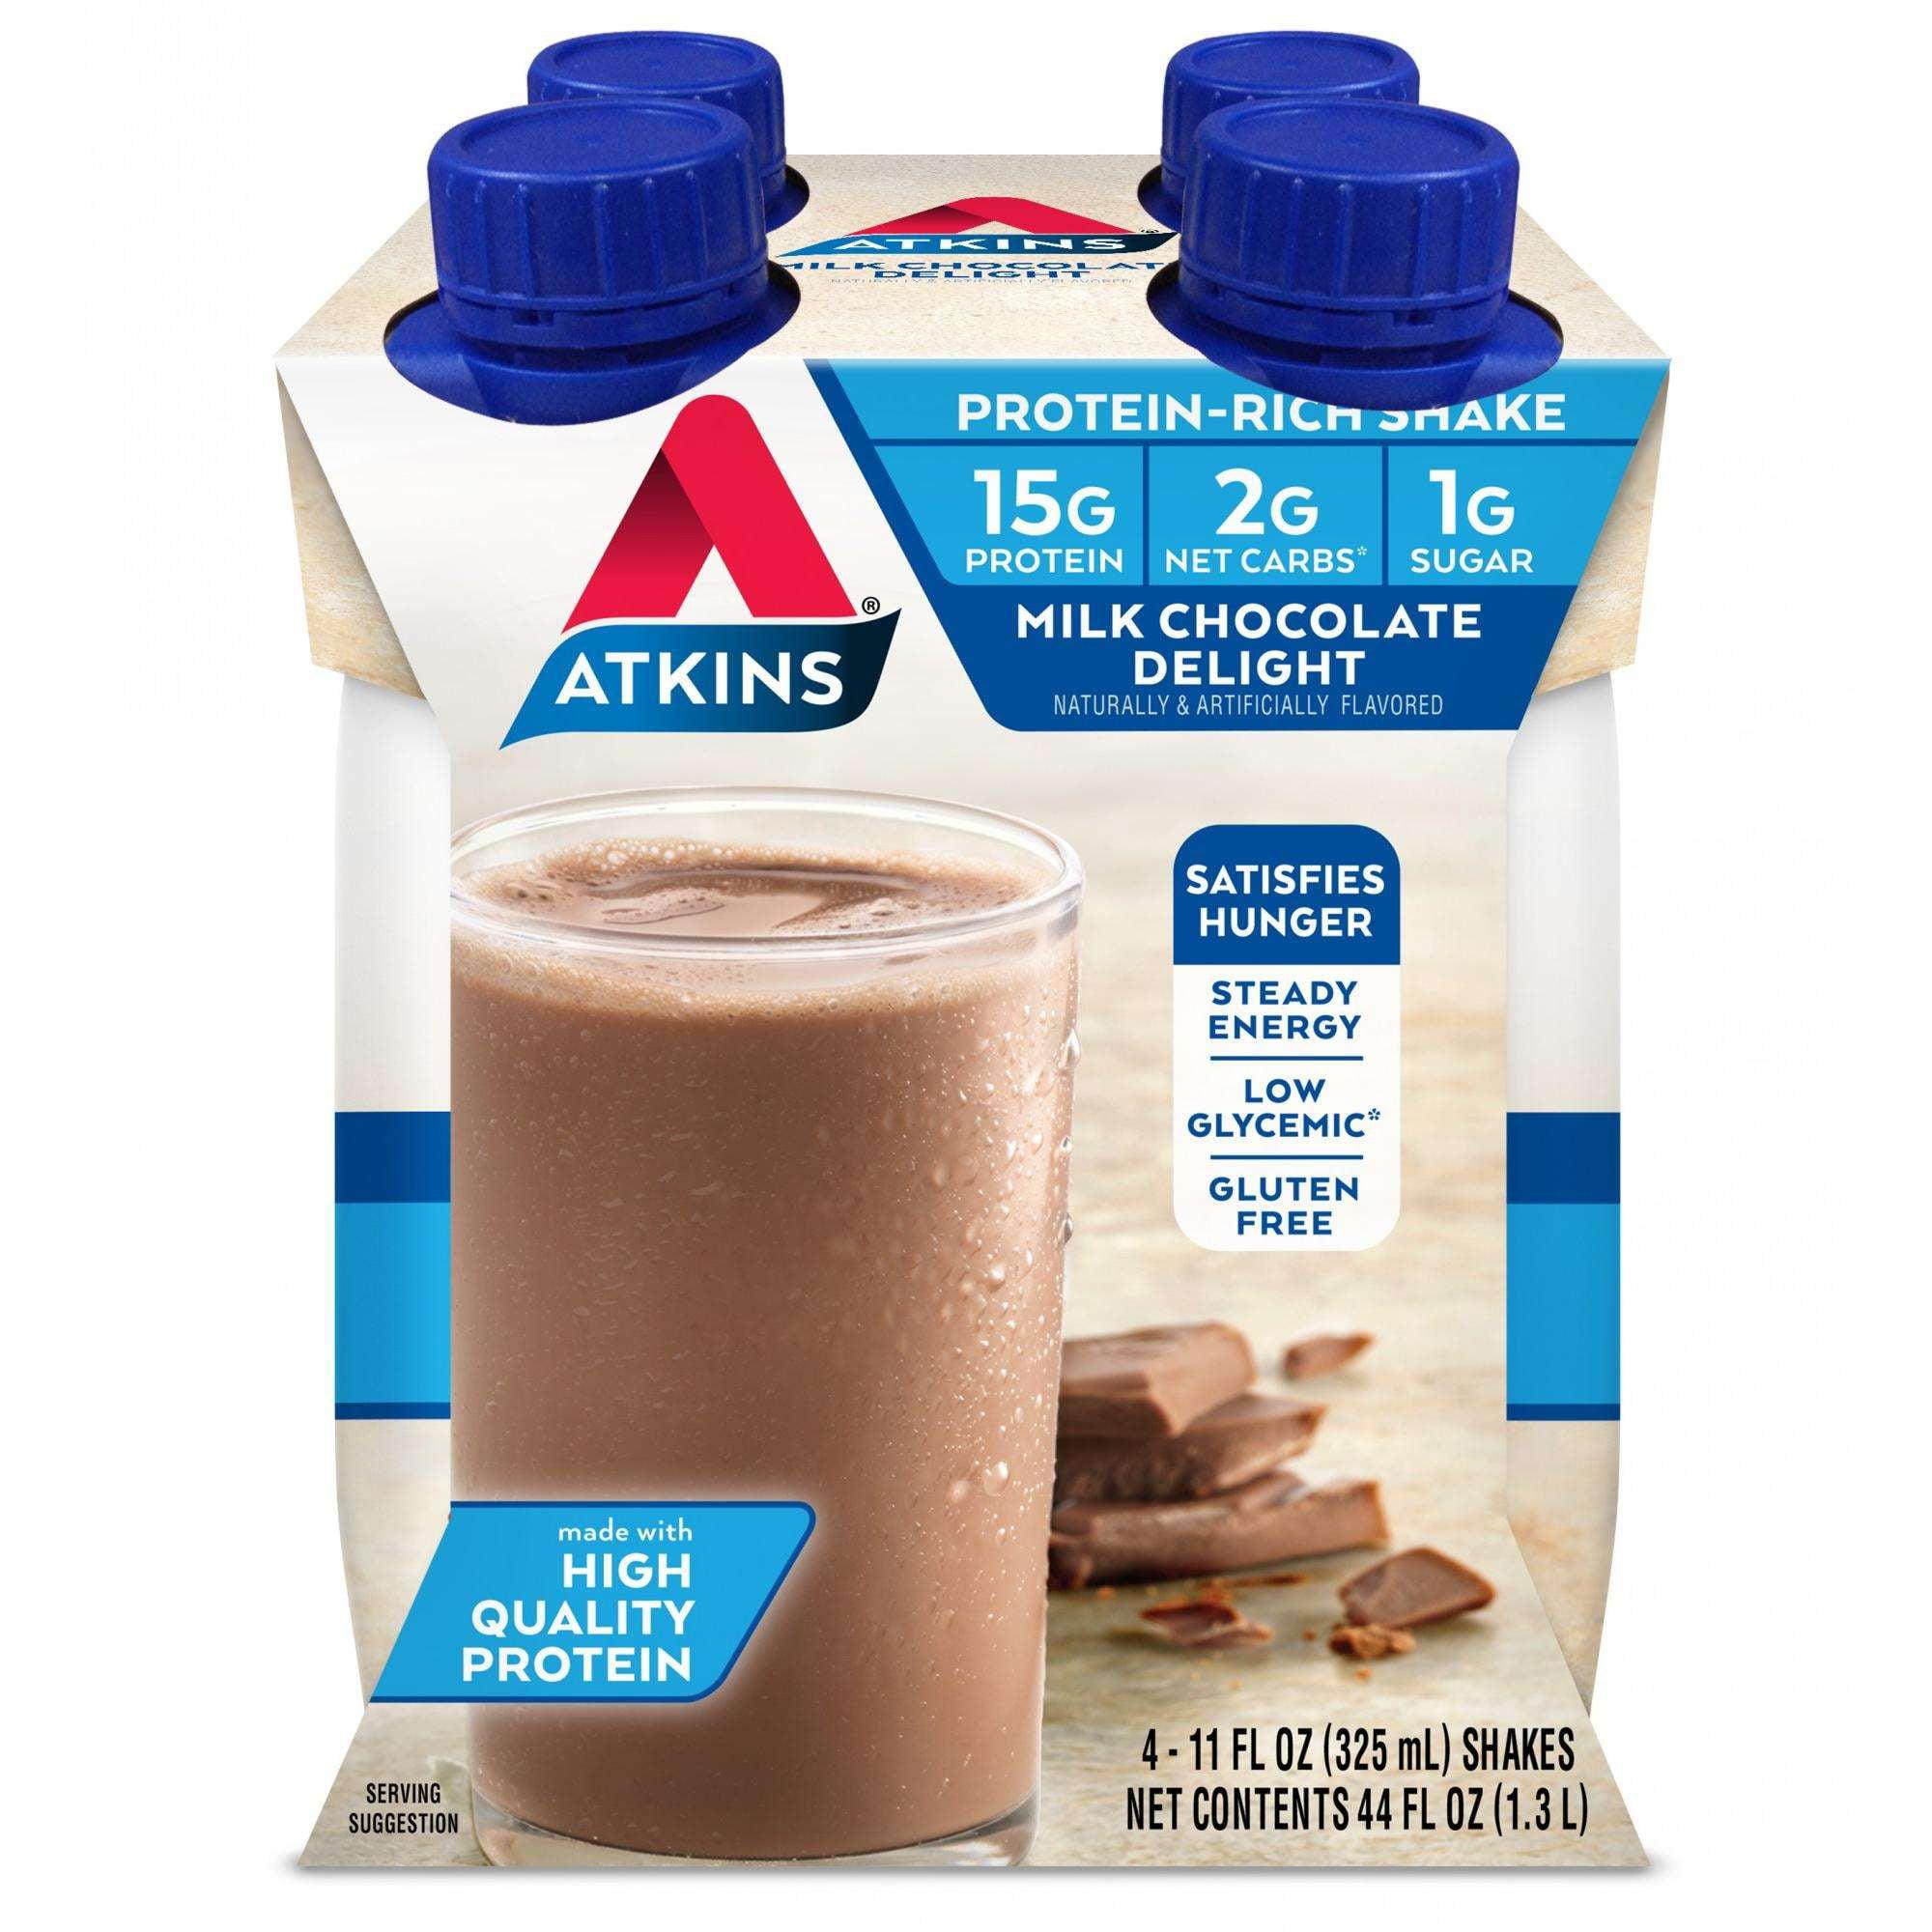 Atkins Milk Chocolate Delight Shake, 11 fl oz, 4-pack (Ready To Drink)